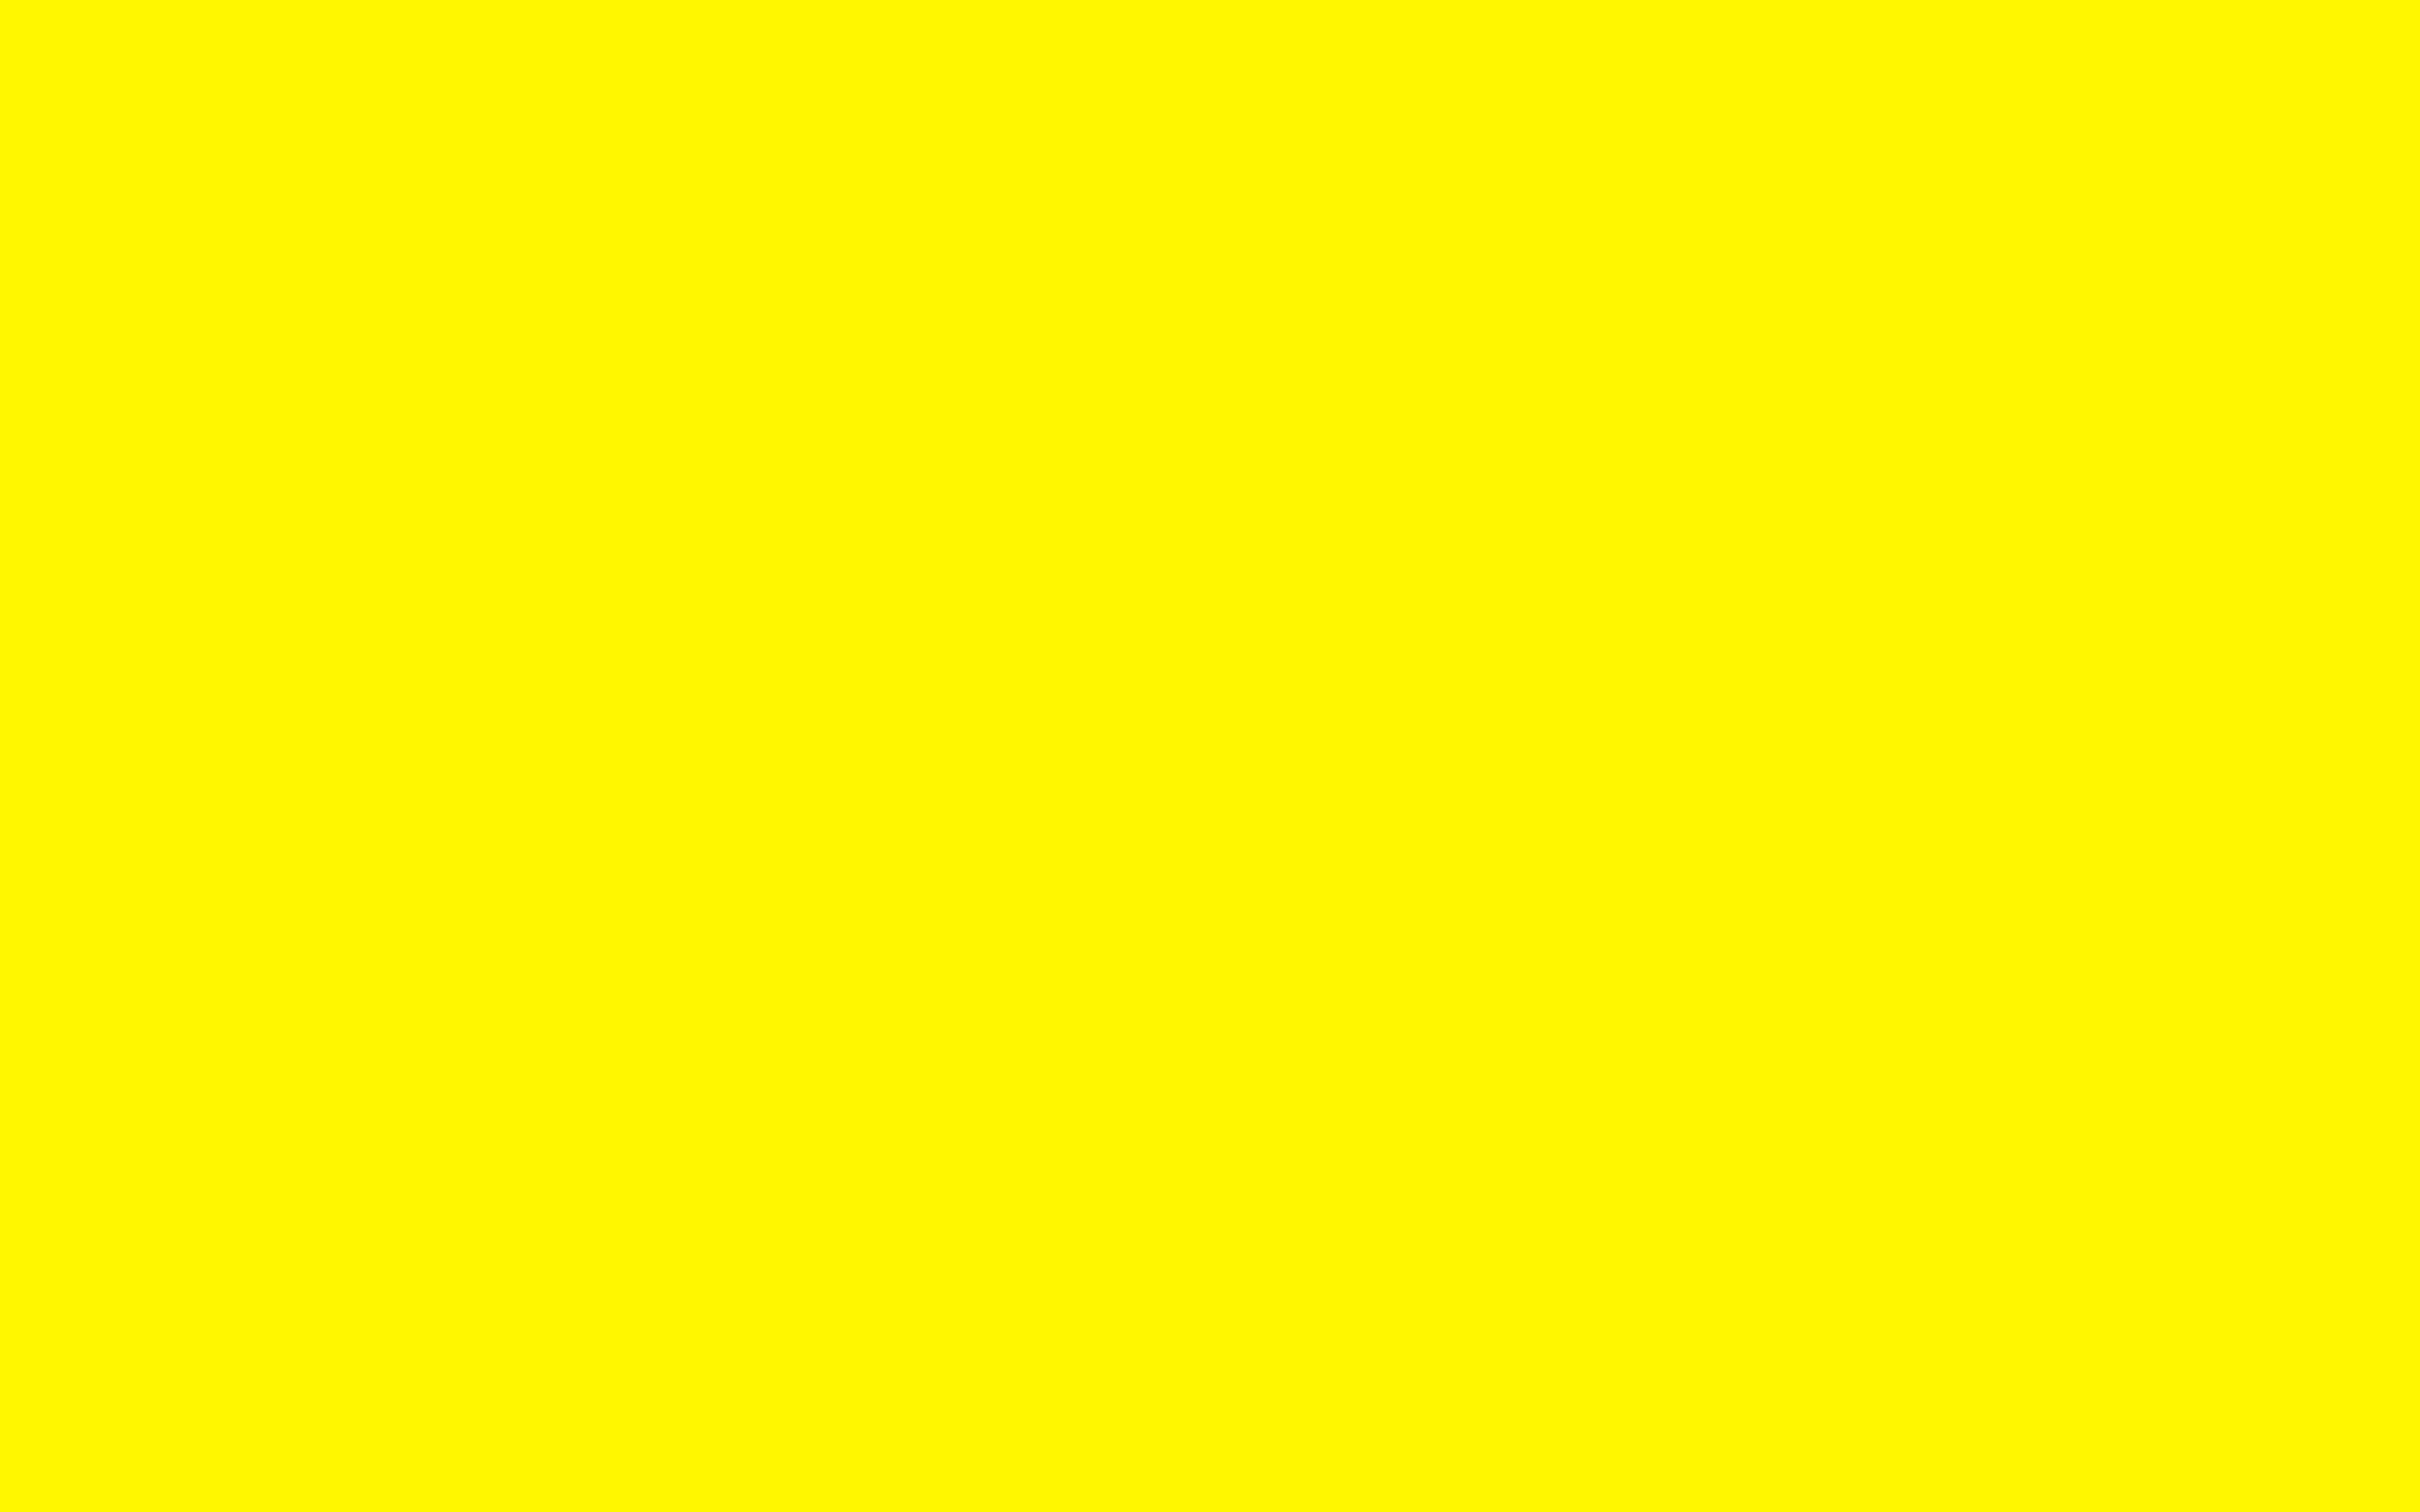 2560x1600 Lemon Solid Color Background